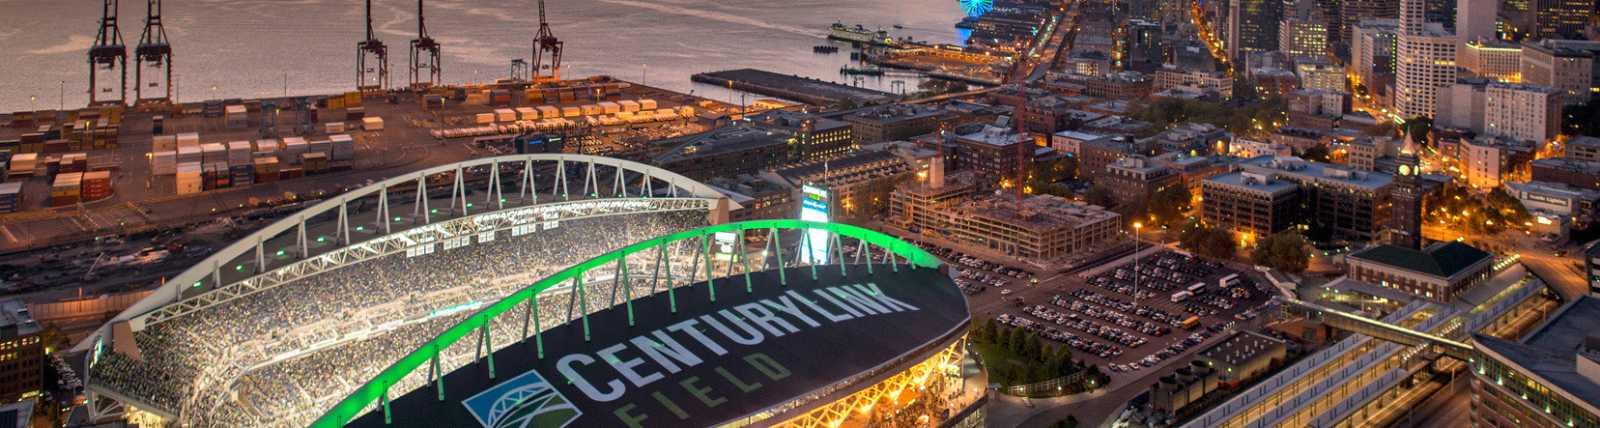 Century Link Field Nighttime